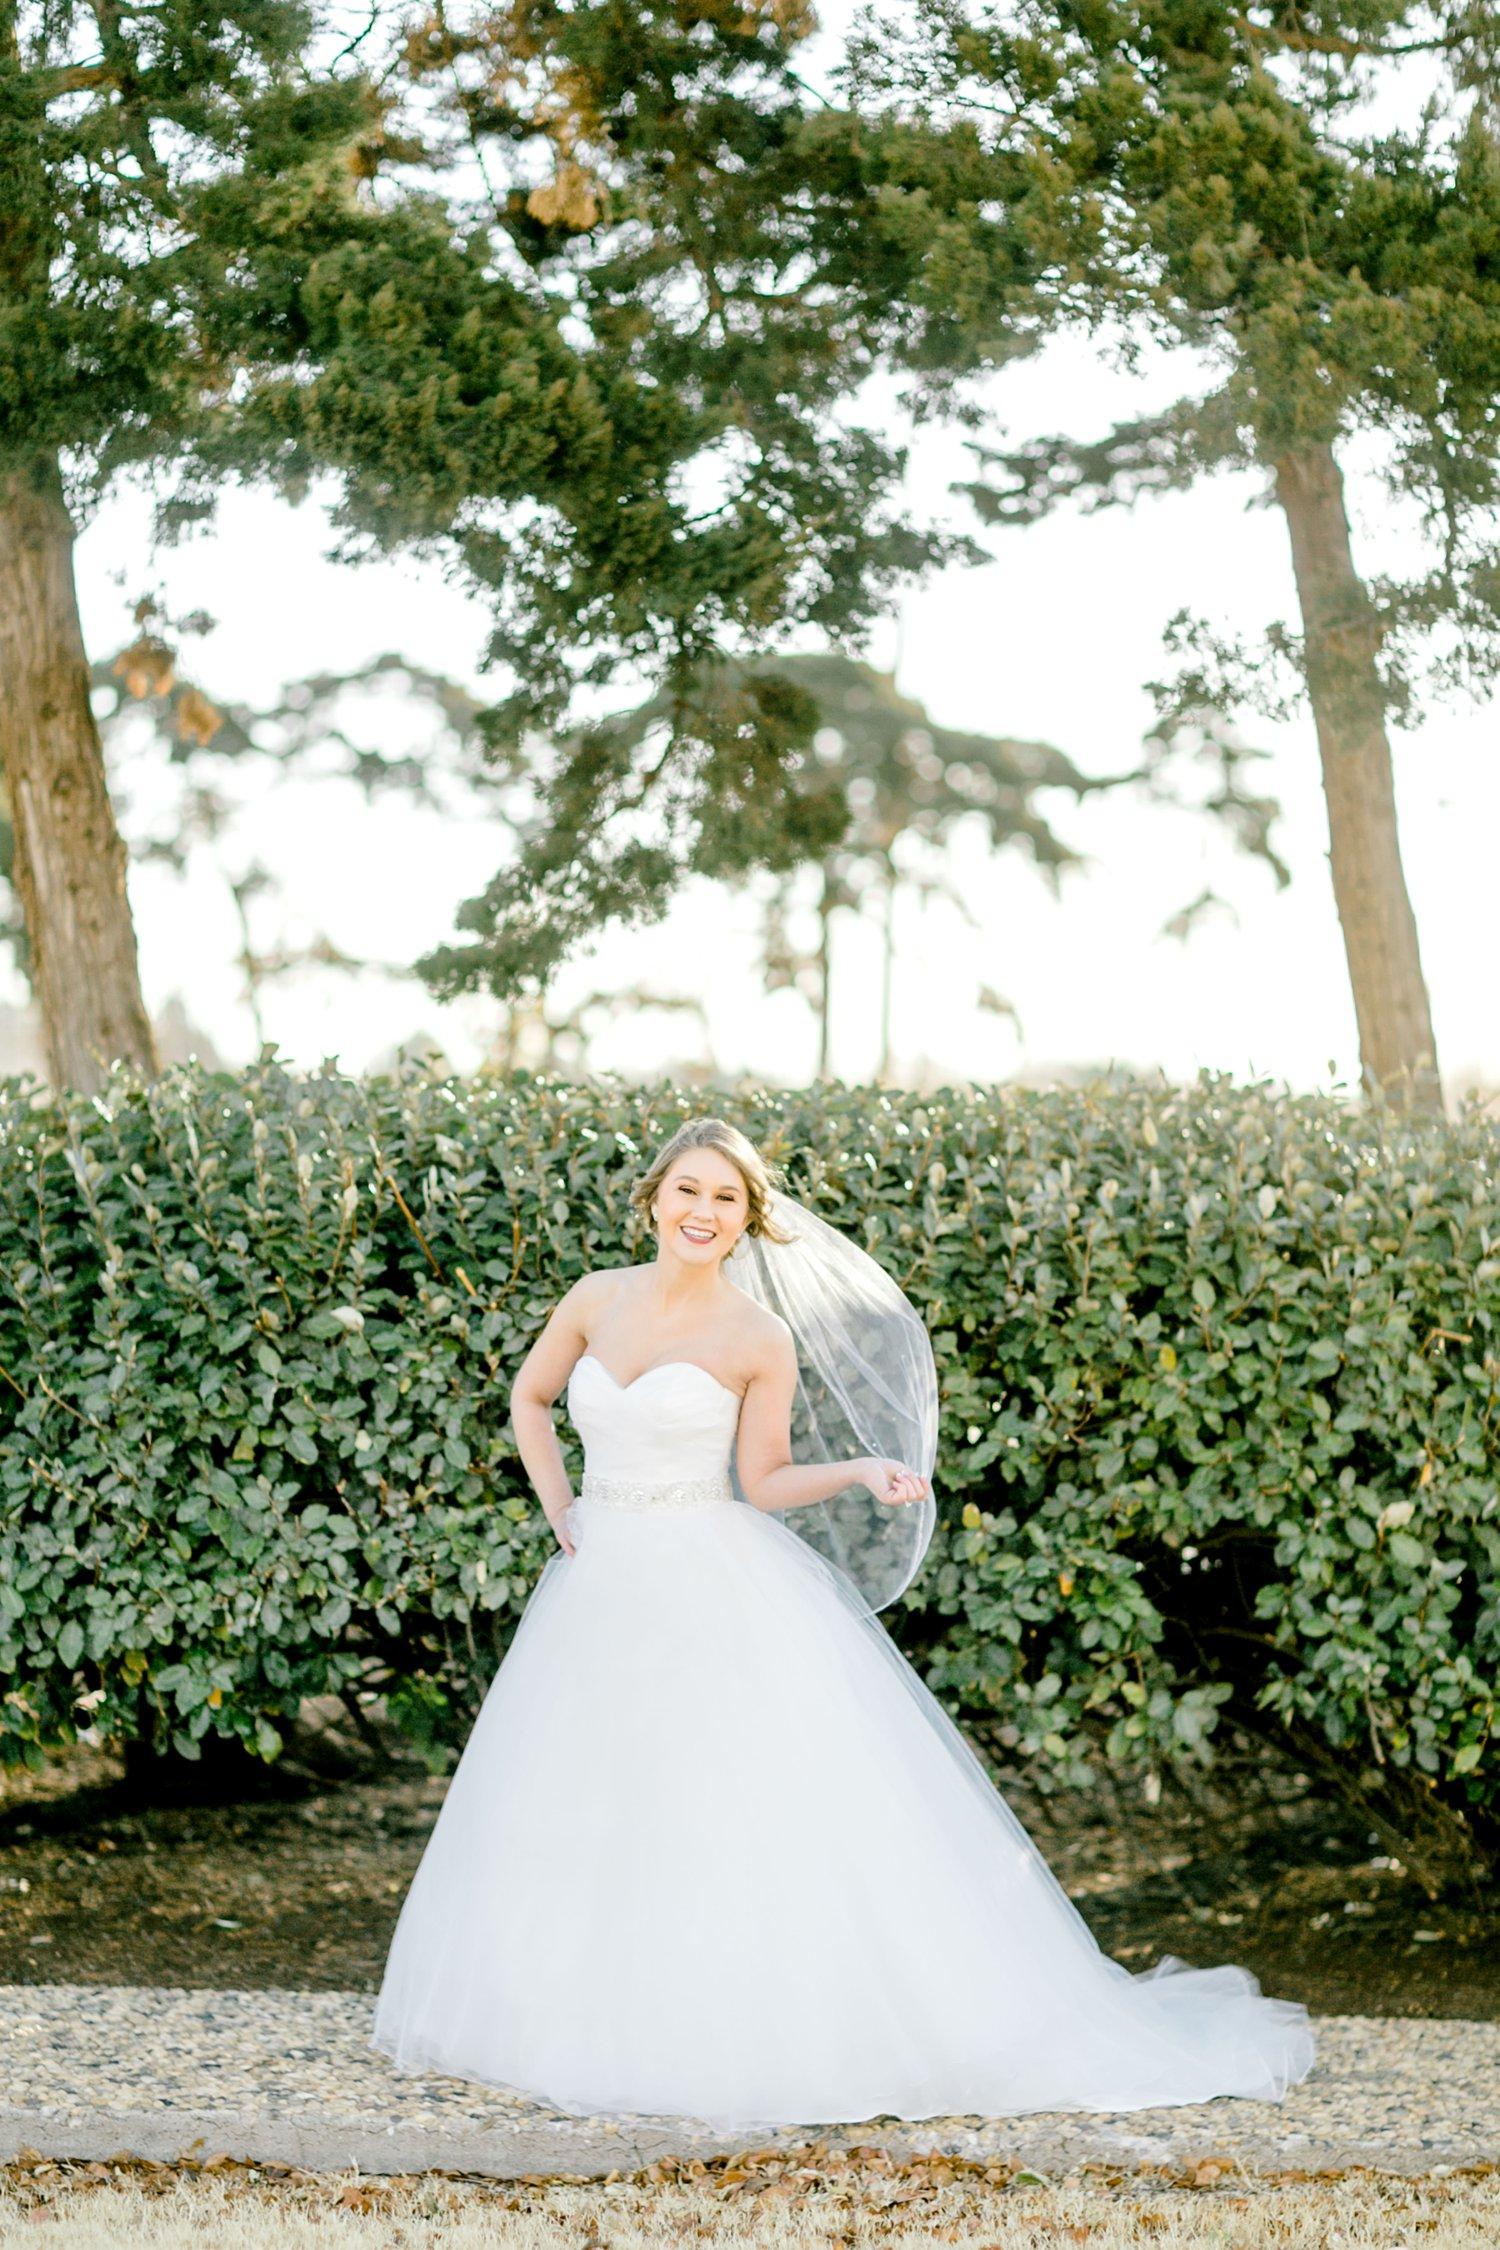 Kaila-cox-bridals-lubbock-photographer0016.jpg